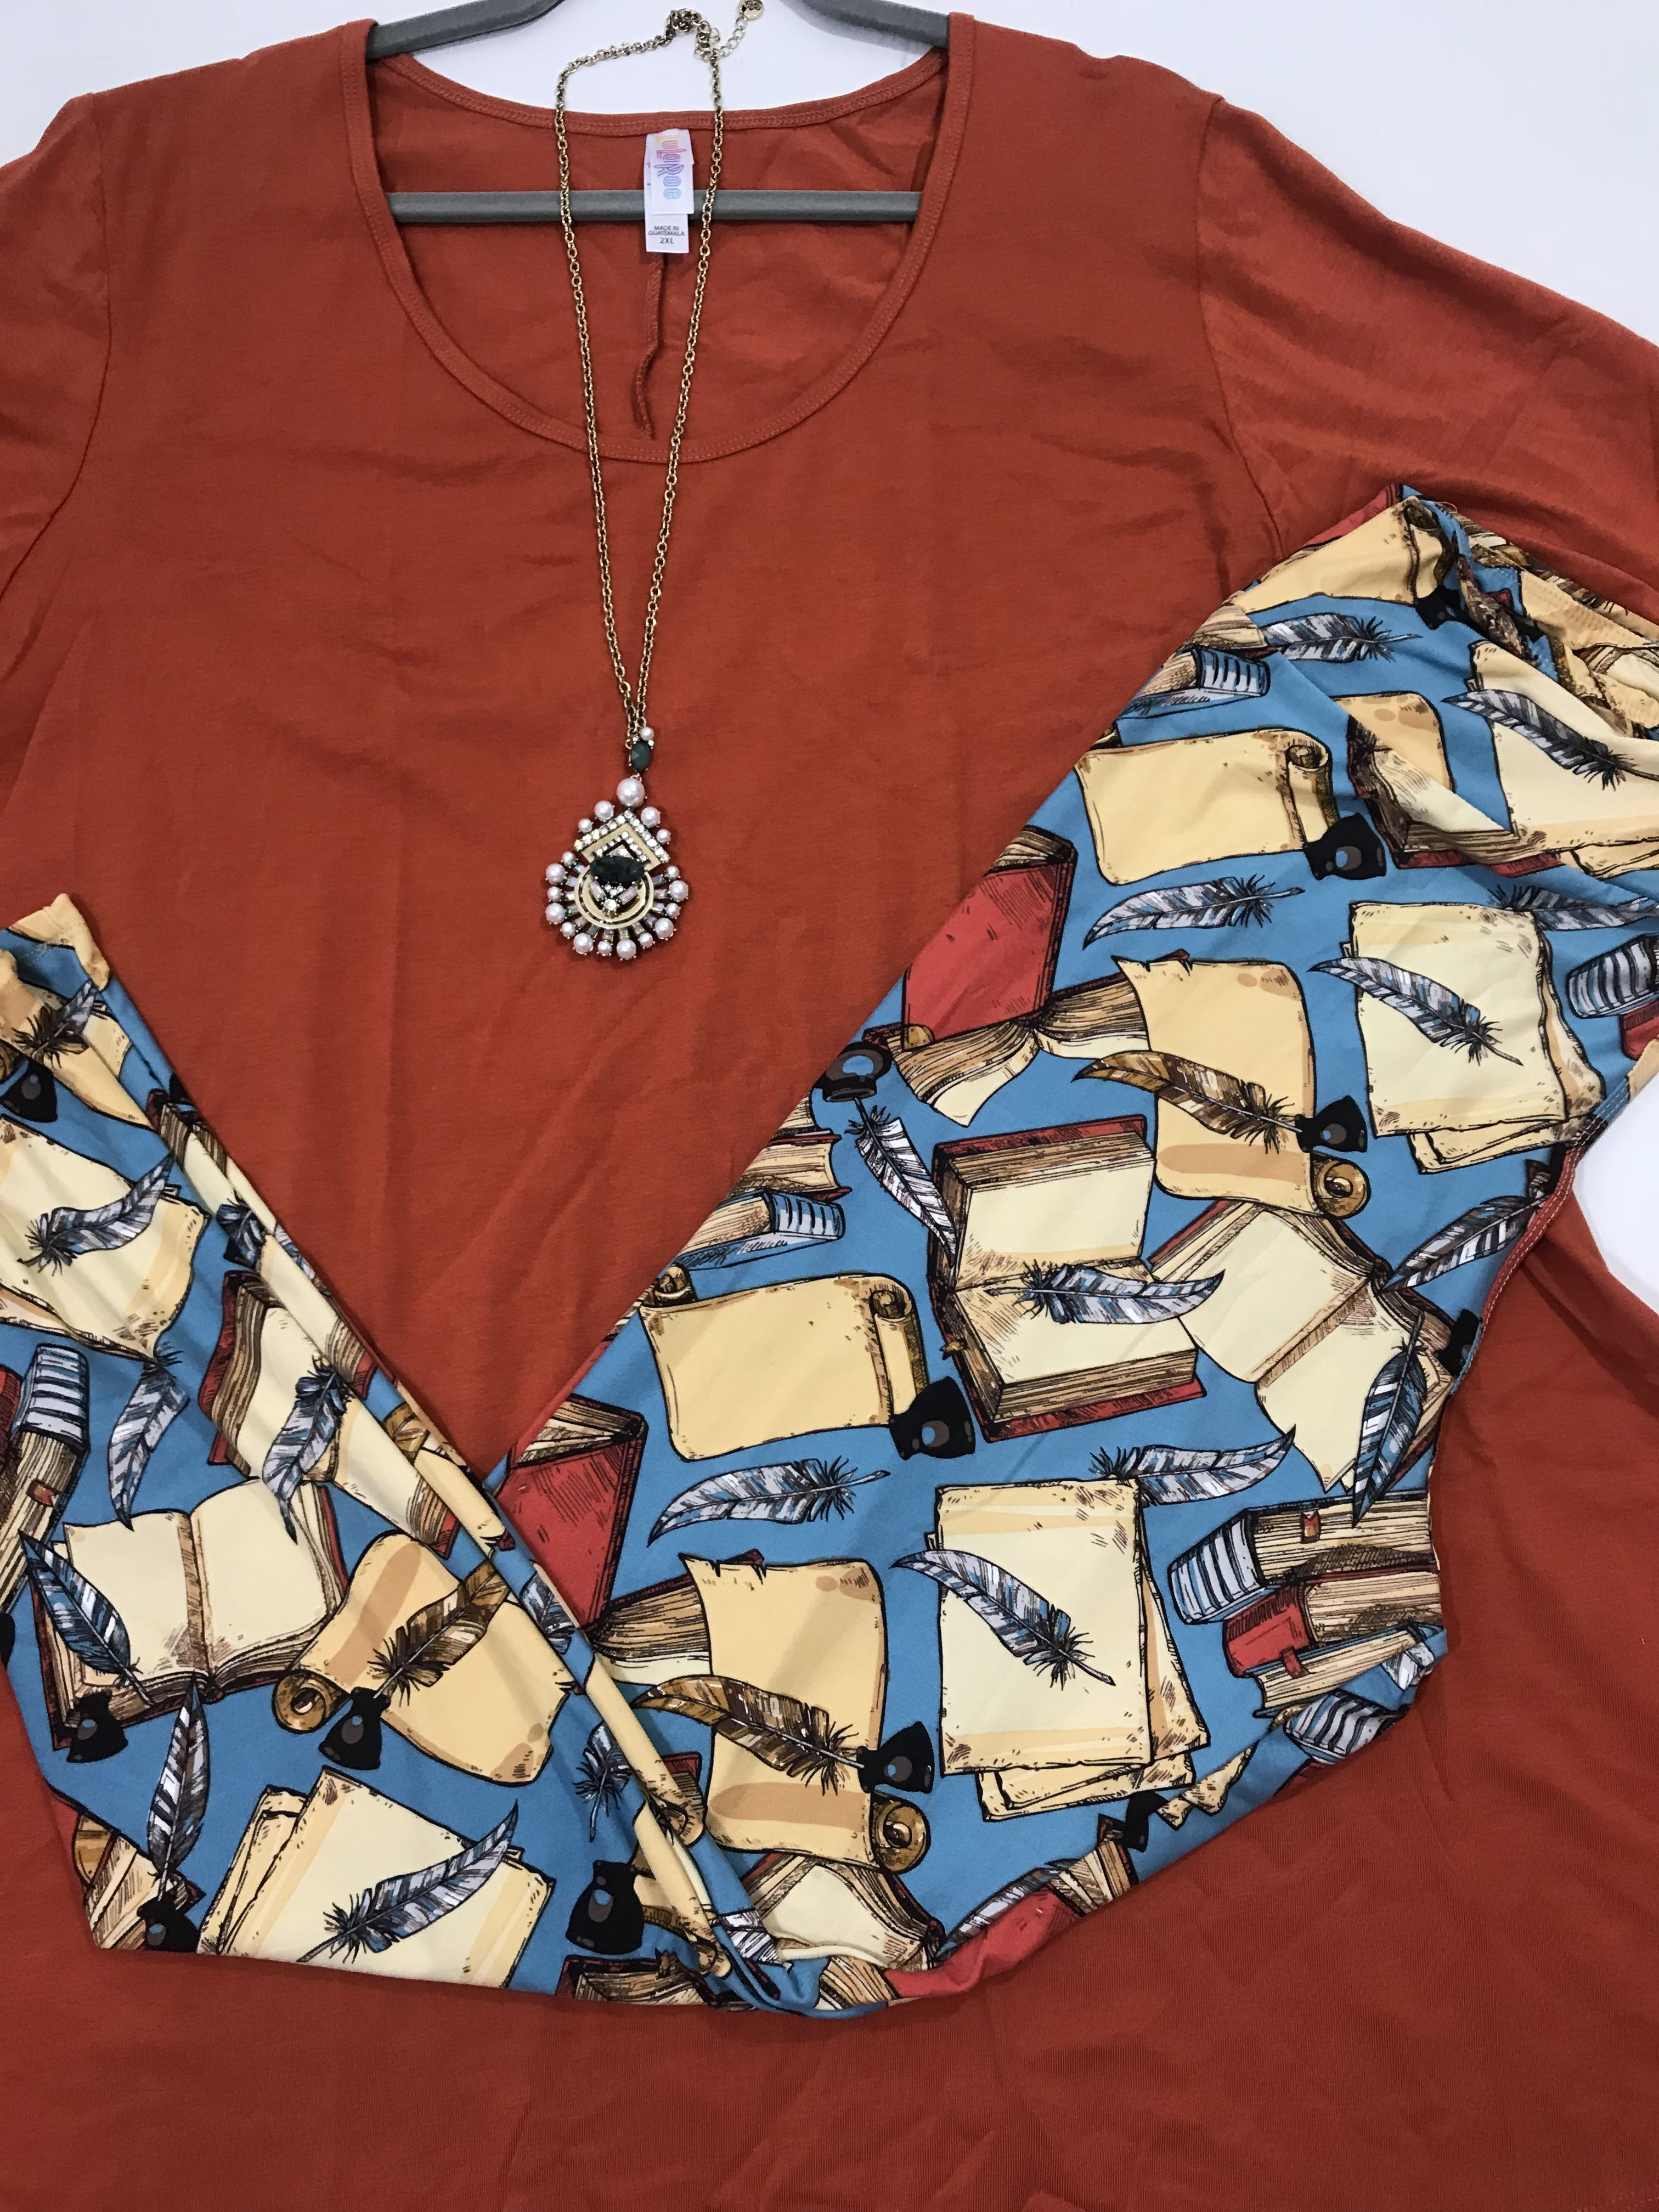 56e248fea5466f Cool item: TC Lularoe Leggings - Coral Birds | Lularoe | Things to sell,  Cool items, Stuff to buy